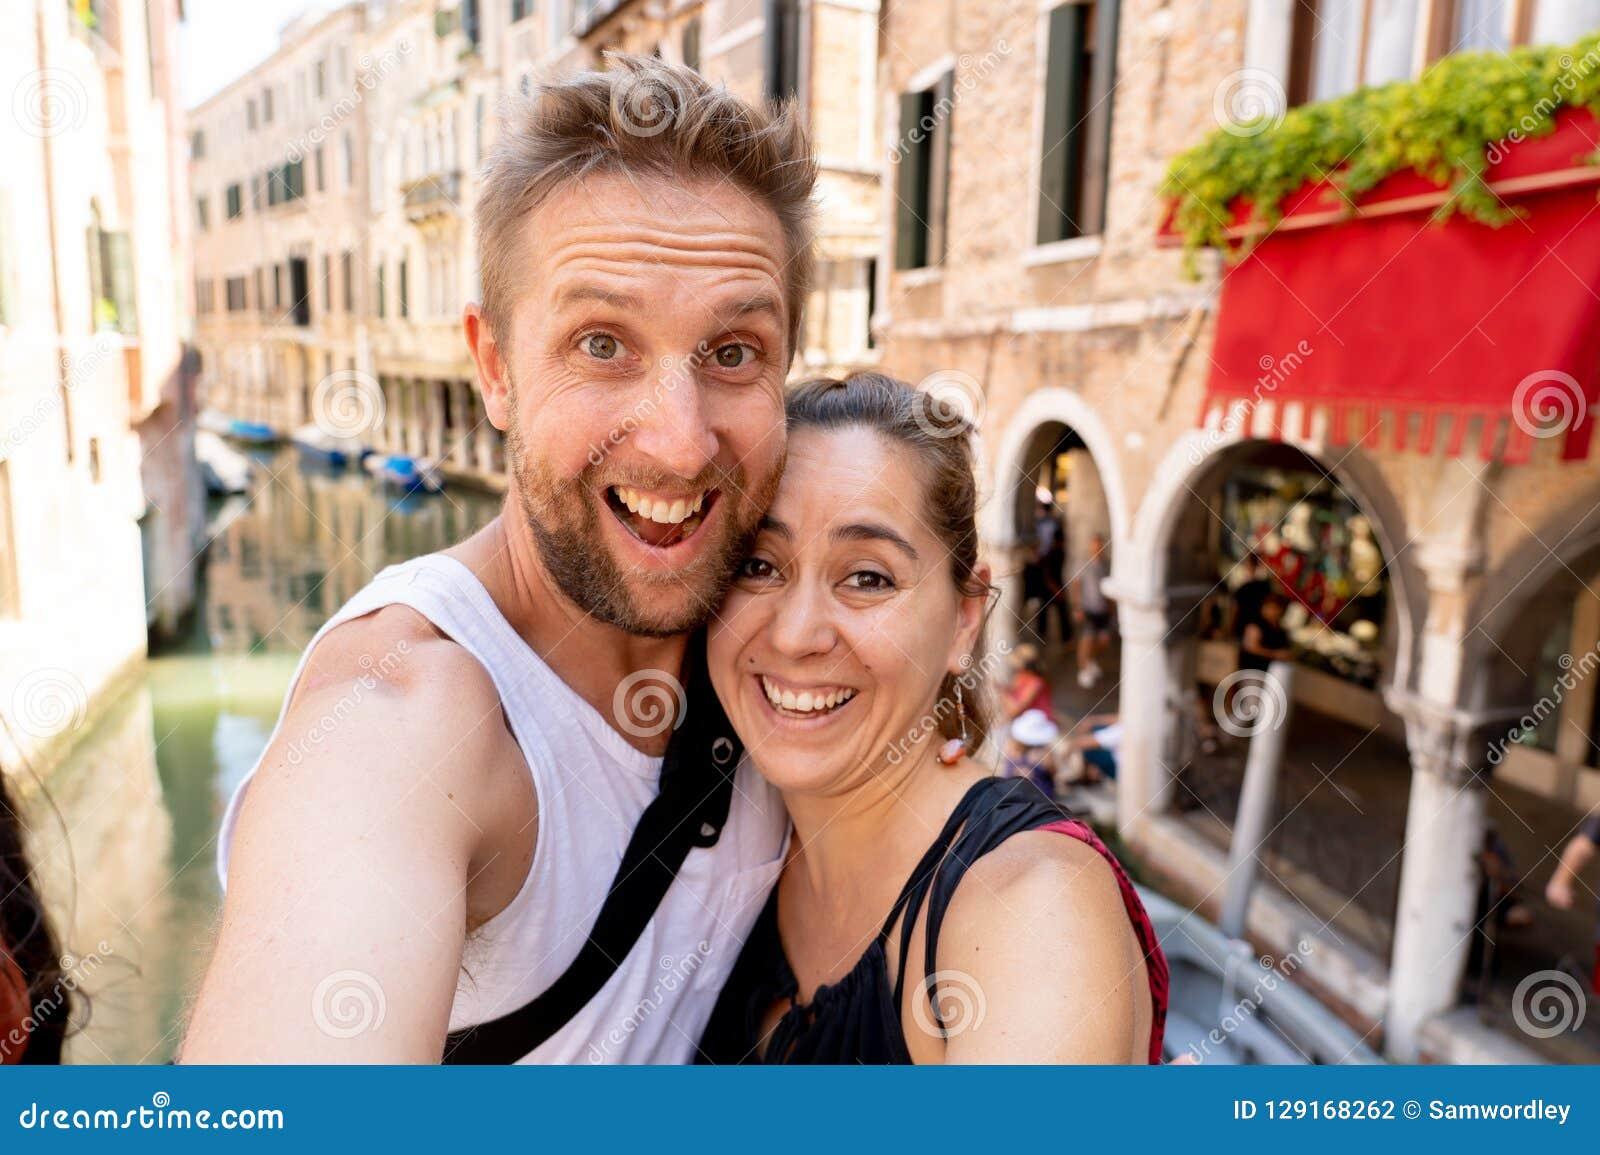 Europa dating